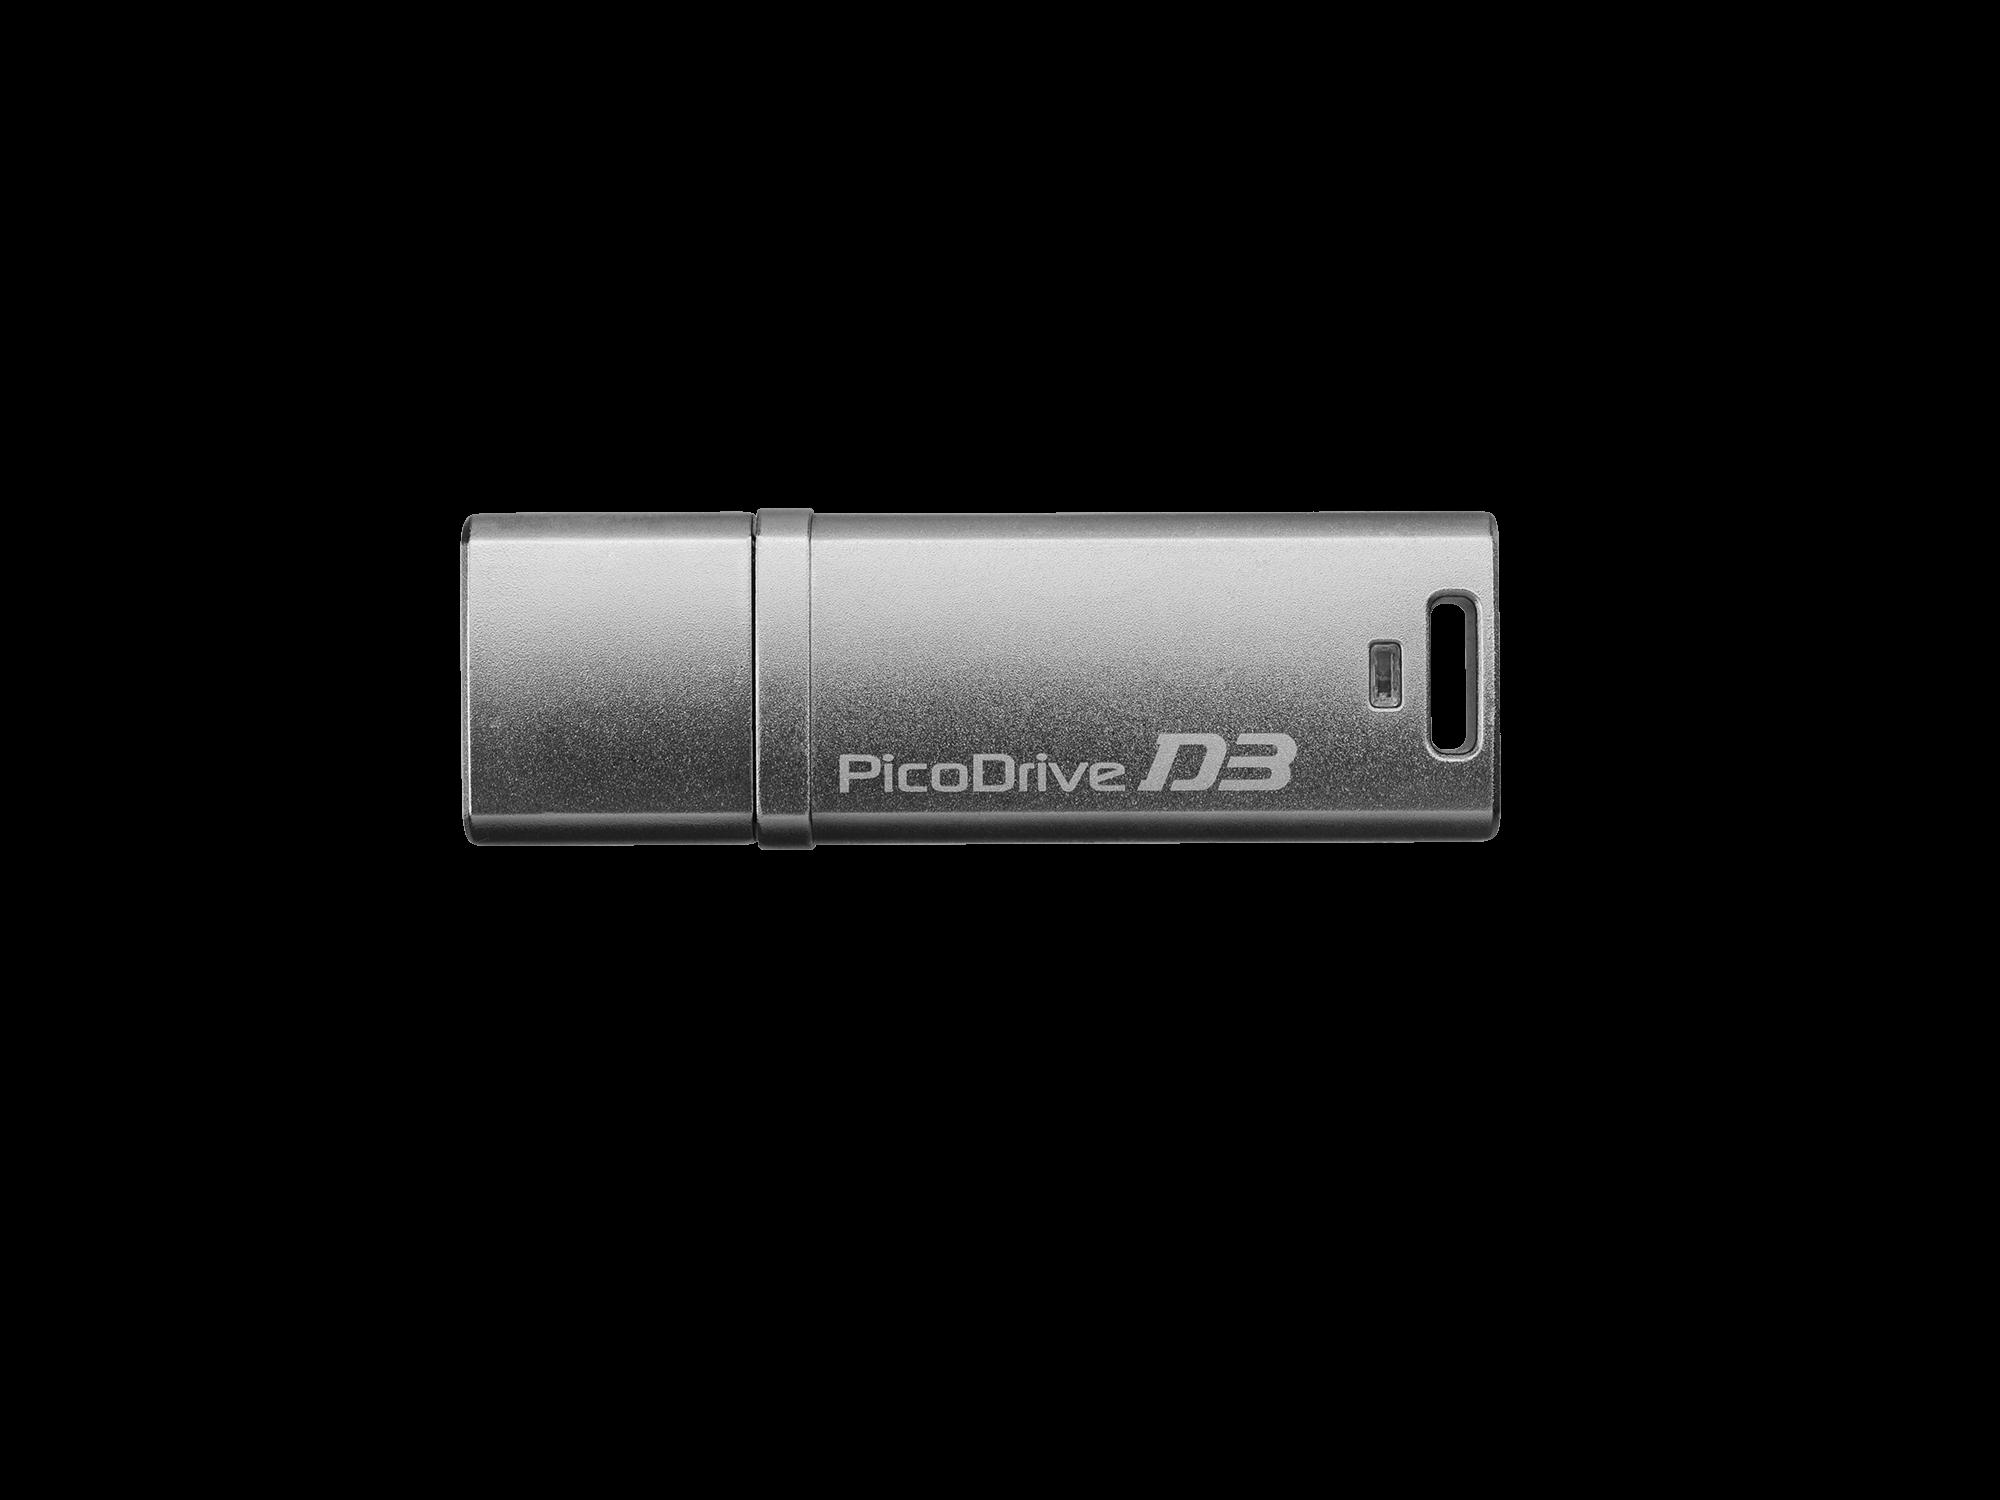 GH-UFD3-*Dシリーズ